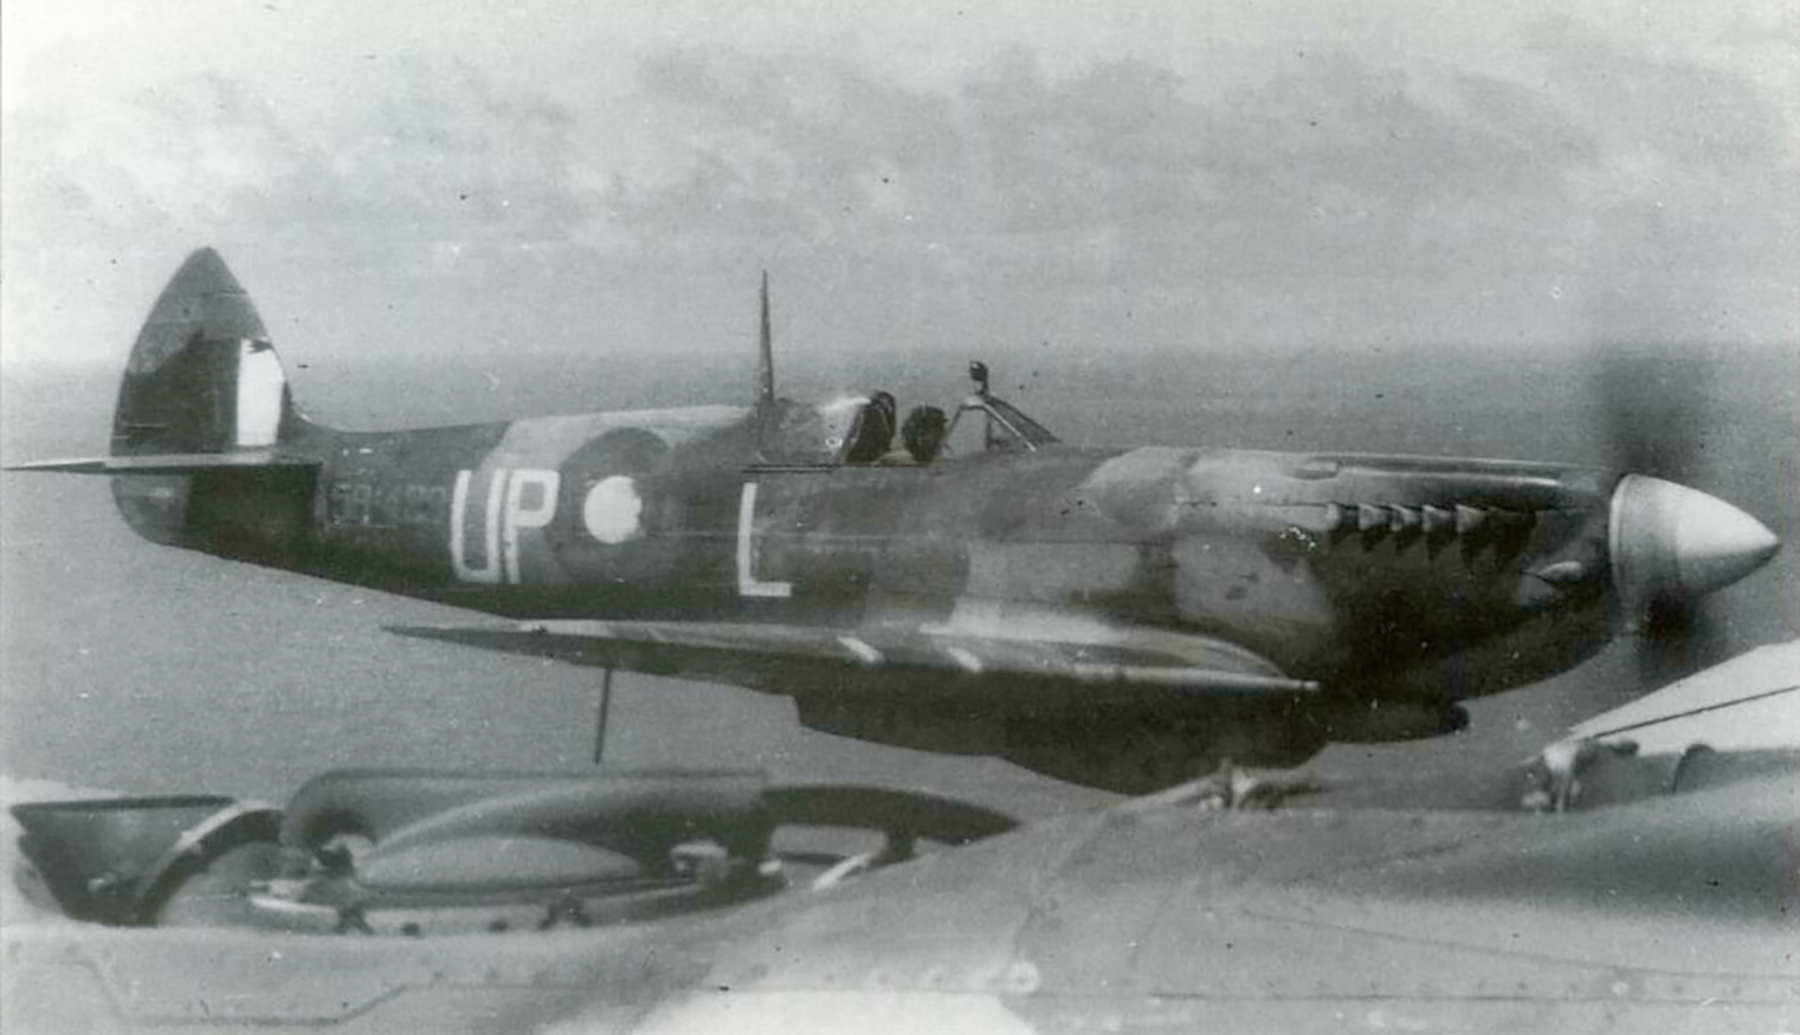 Spitfire LFVIII RAAF 79Sqn UPL A58 489 over PNG 1944 01